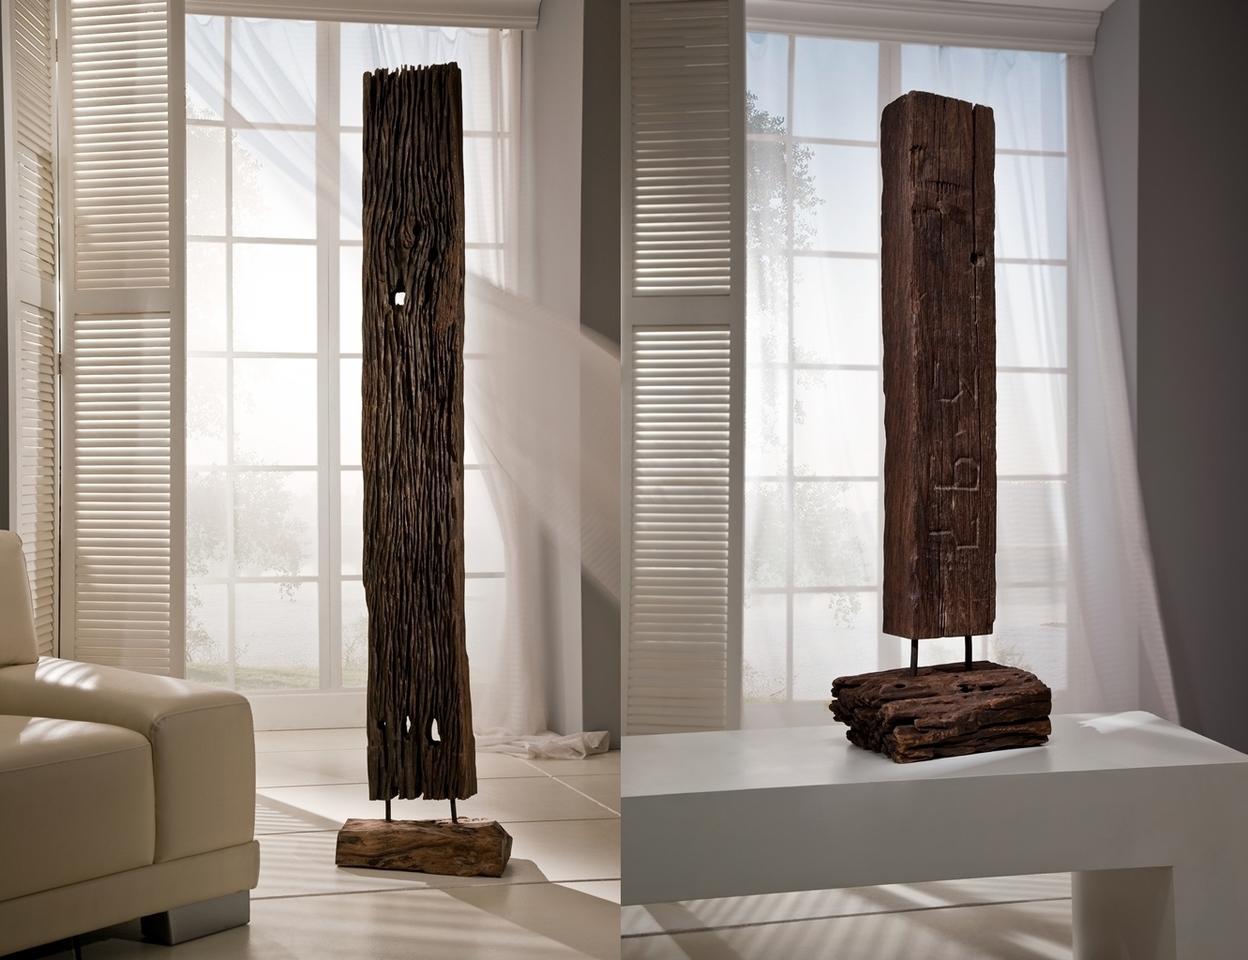 teakholz deko bahnschwelle unikat von henke g nstig bestellen skanm bler. Black Bedroom Furniture Sets. Home Design Ideas